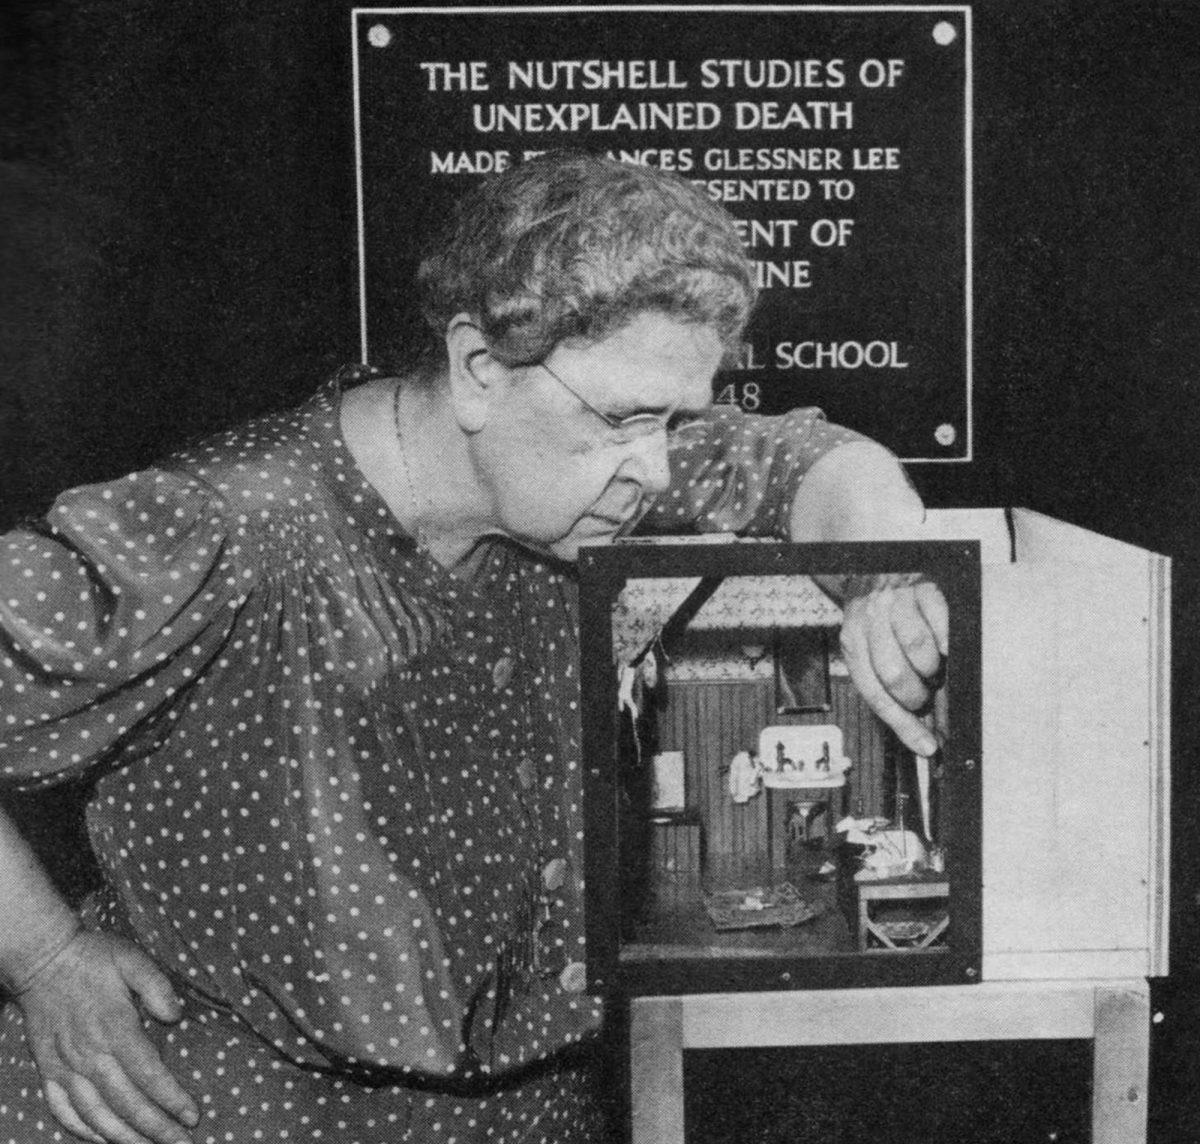 Frances Glessner Lee, la madre de la ciencia forense